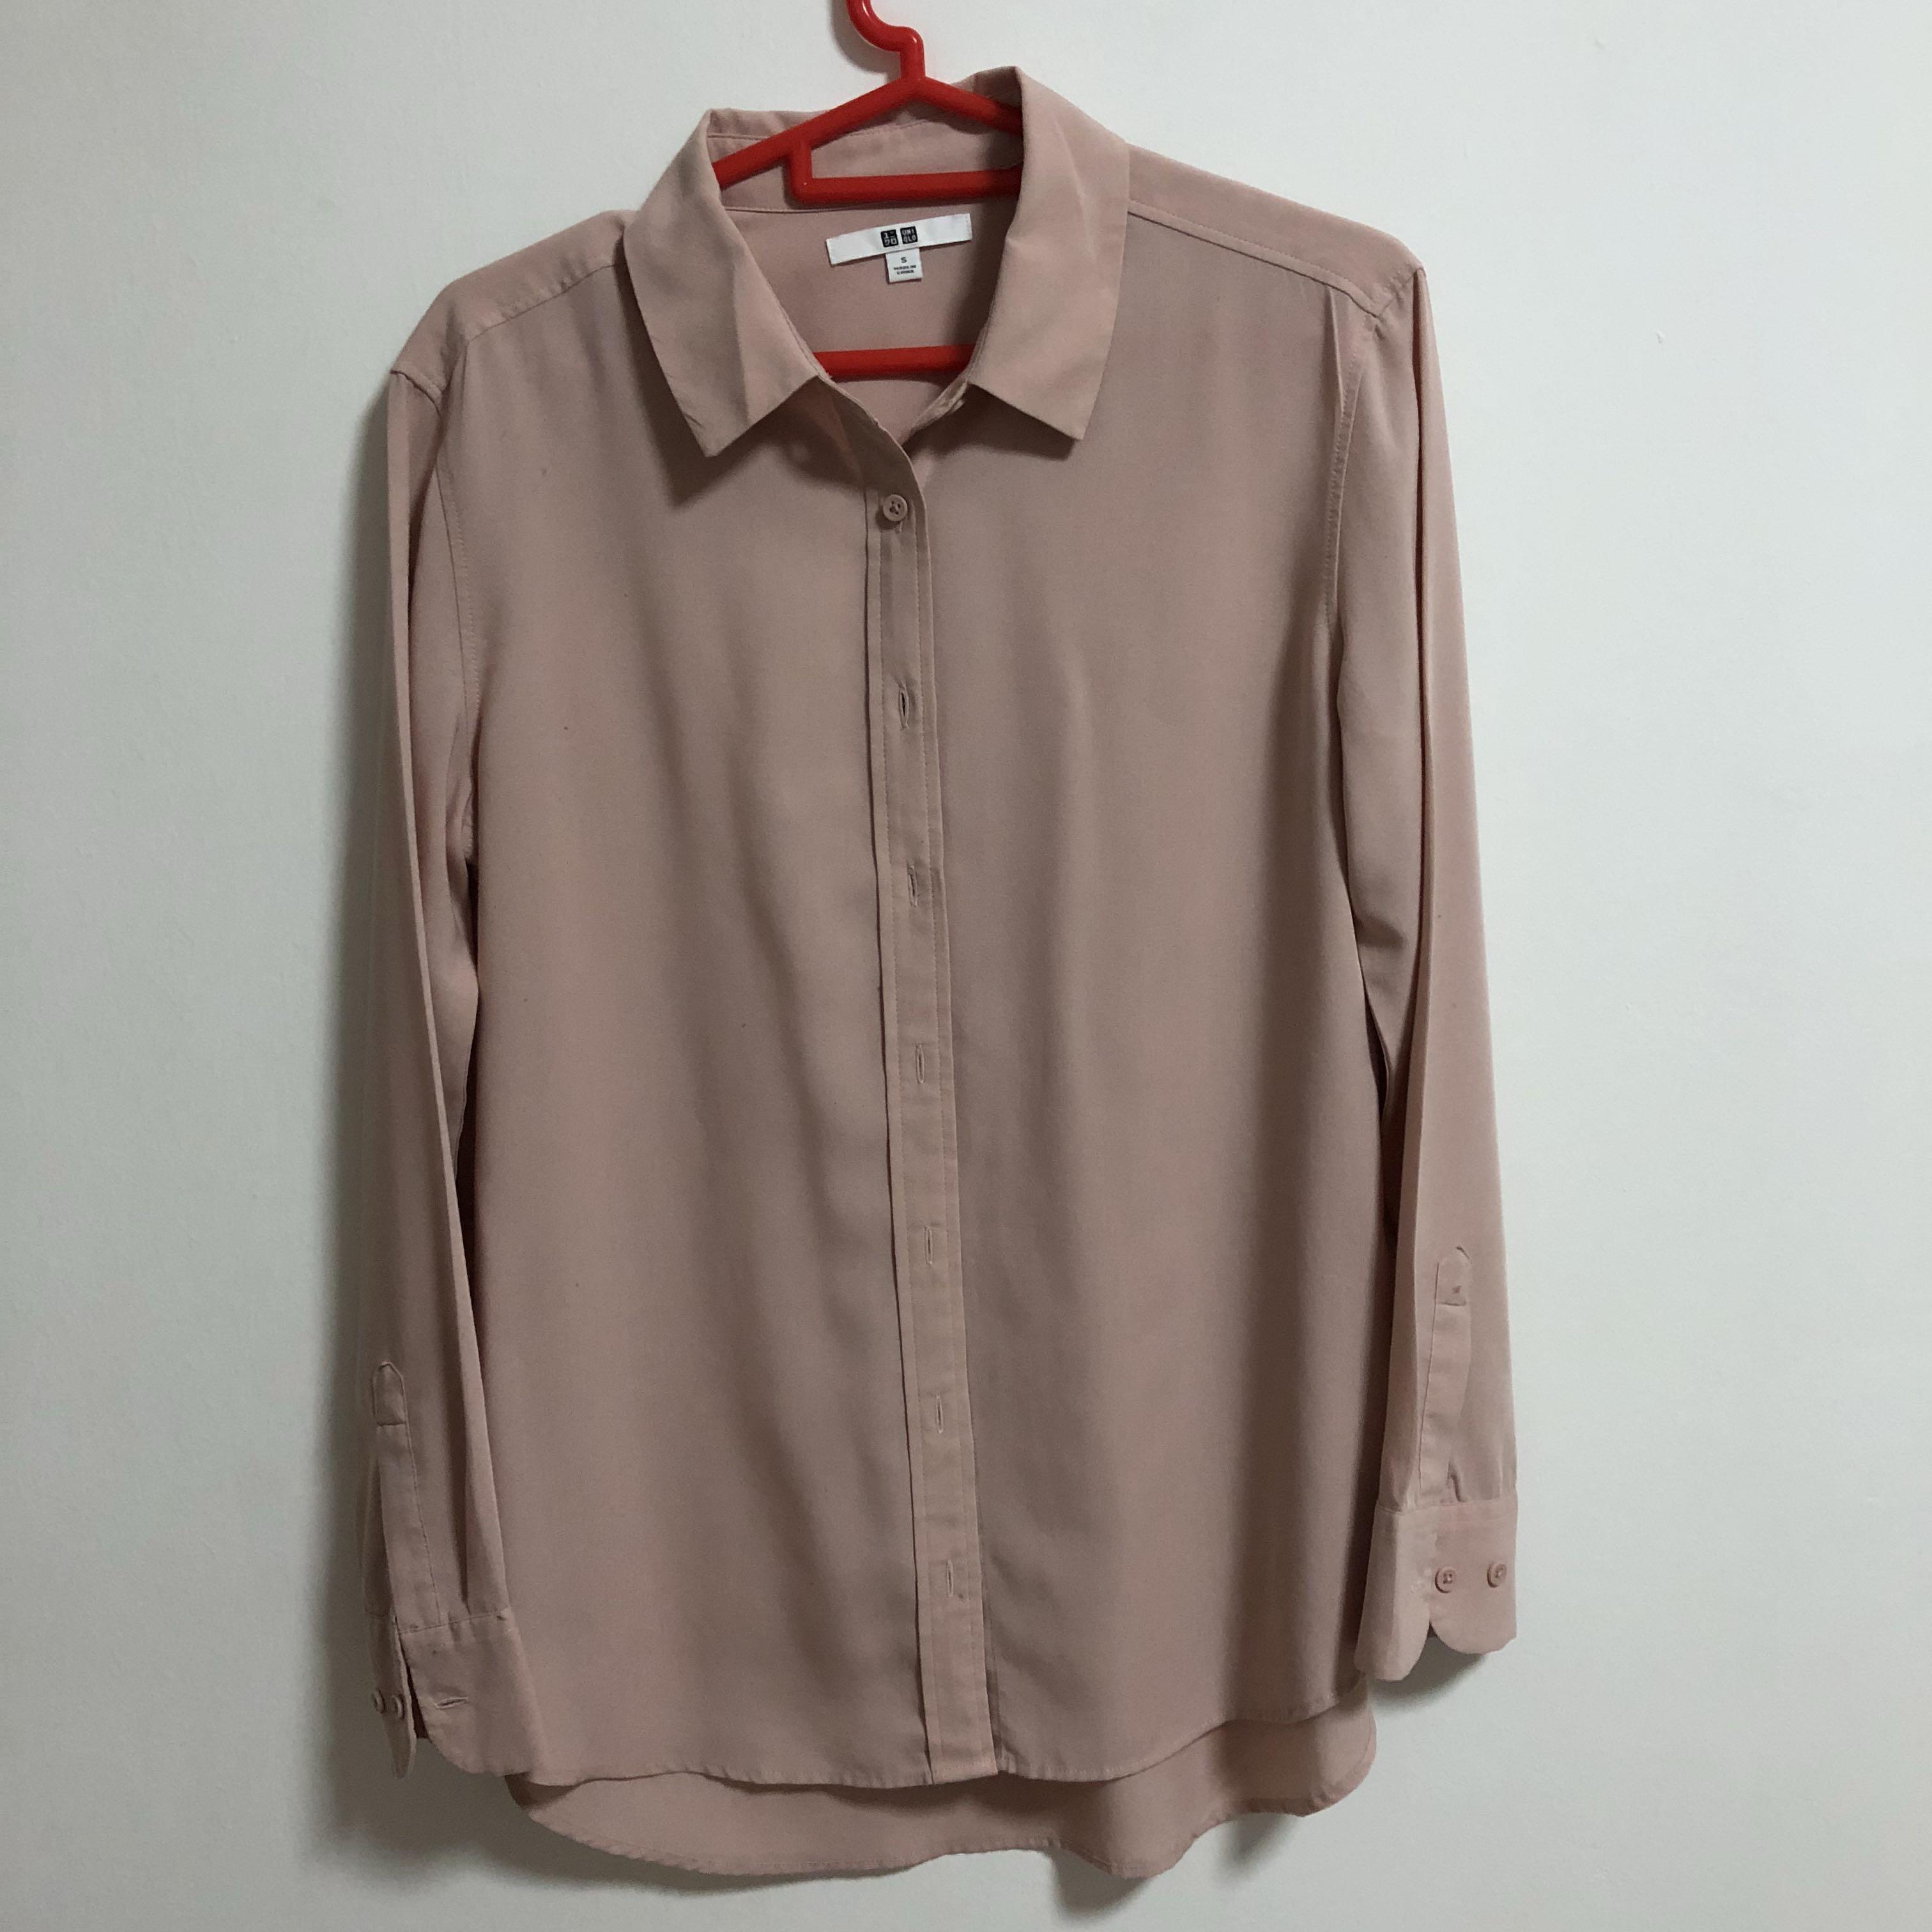 6d509a55 Uniqlo Blush Pink Rayon Button Down Collared Blouse, Women's Fashion ...